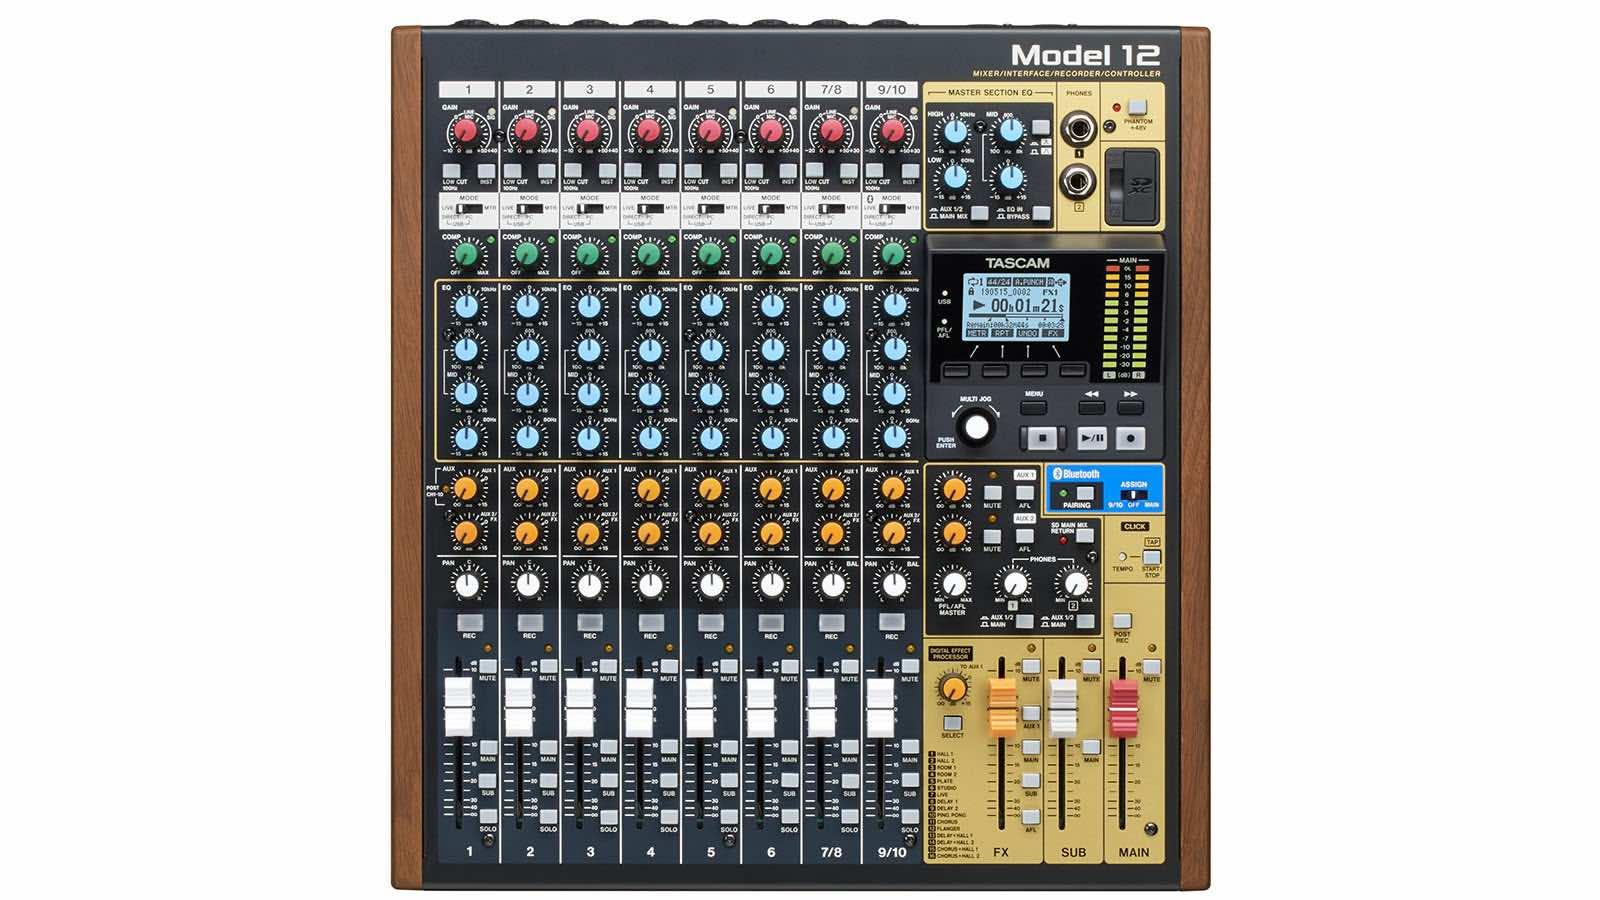 Tascam Model 12 mixer hardware digital usb rec live studio aeb price audiofader